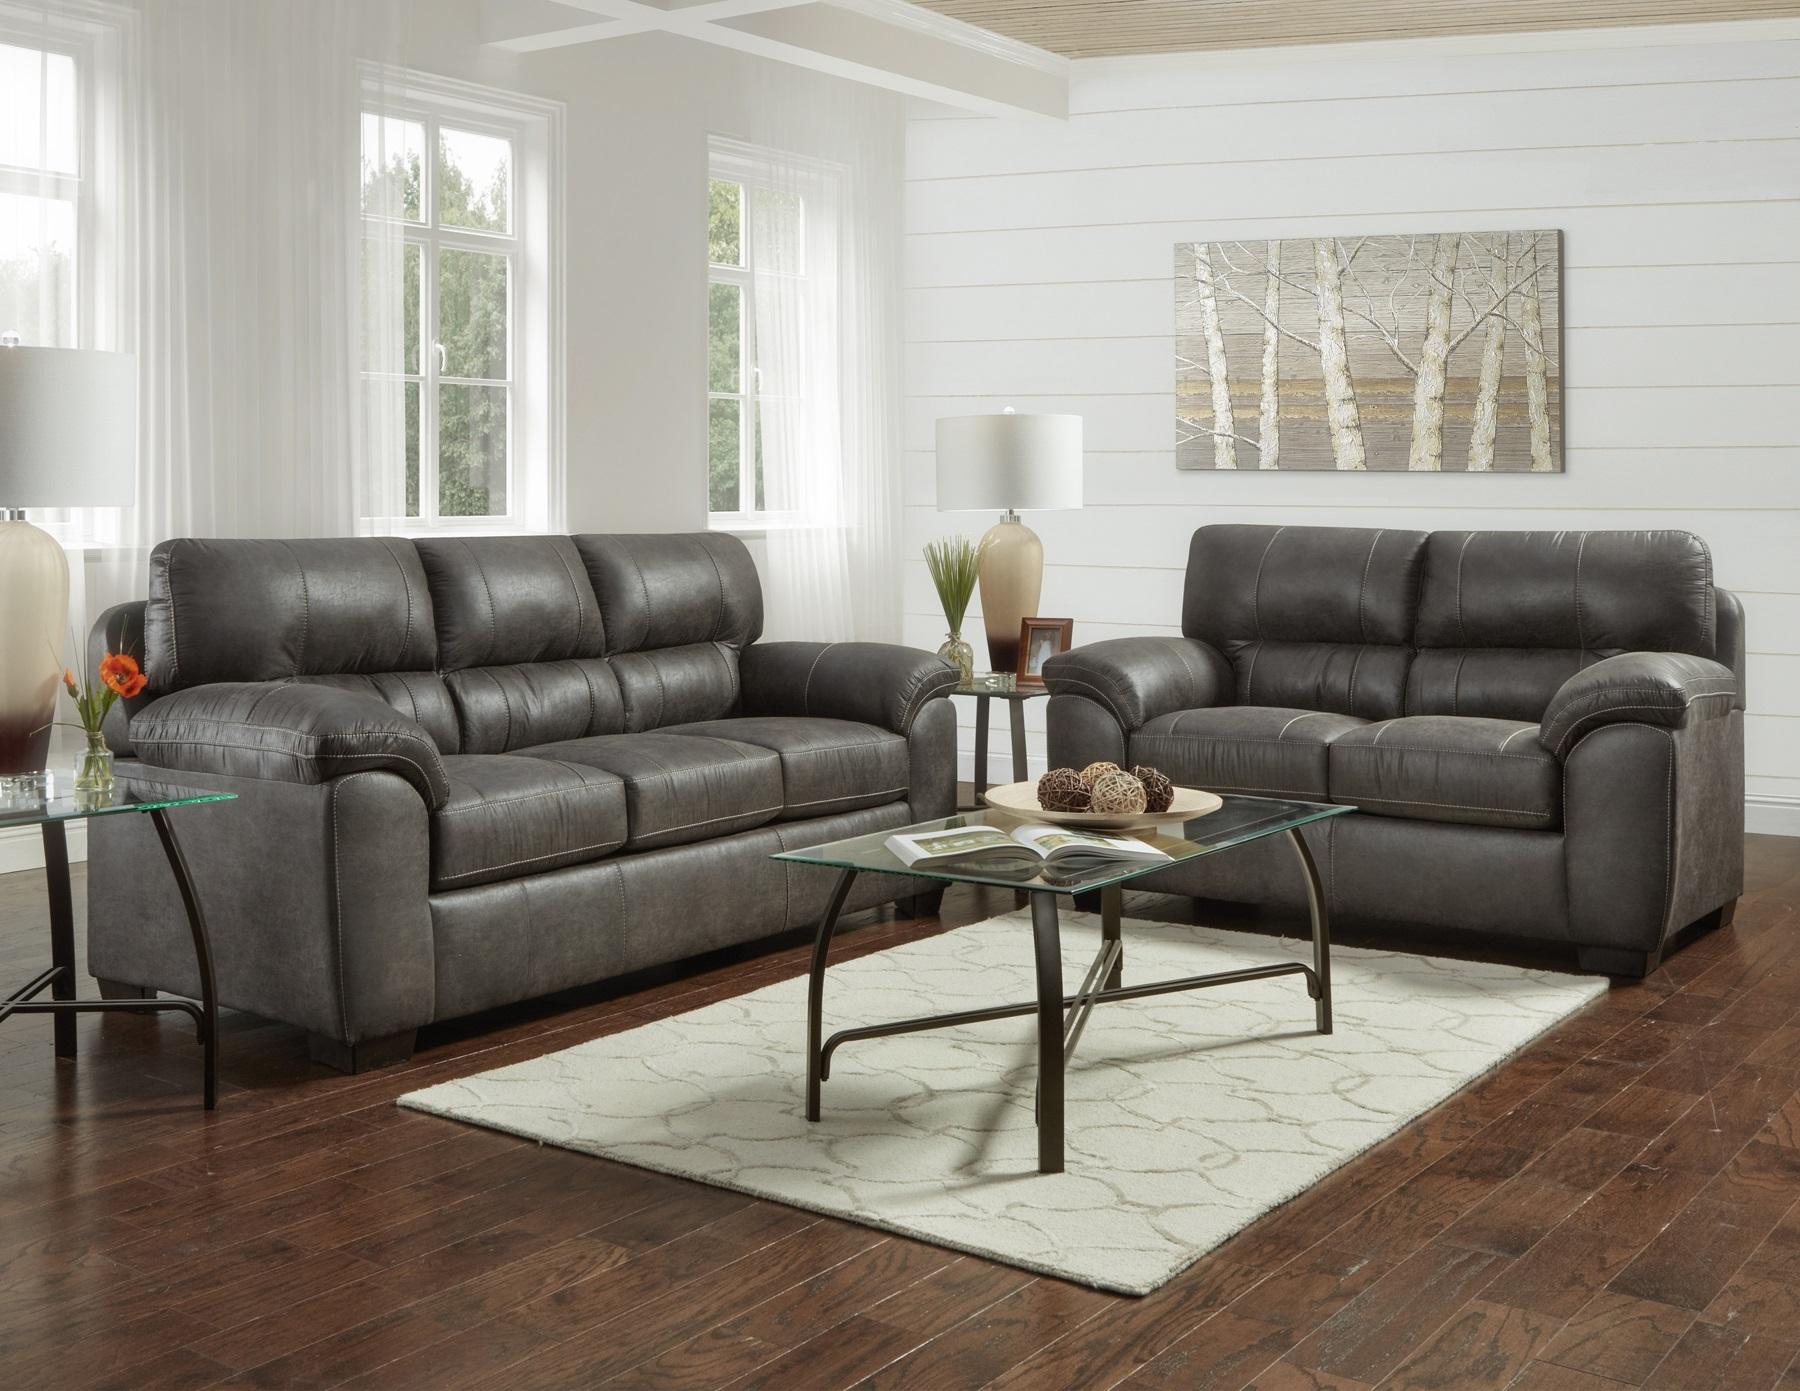 Colders Living Room Furniture » Comfortable Genesis sofas ...